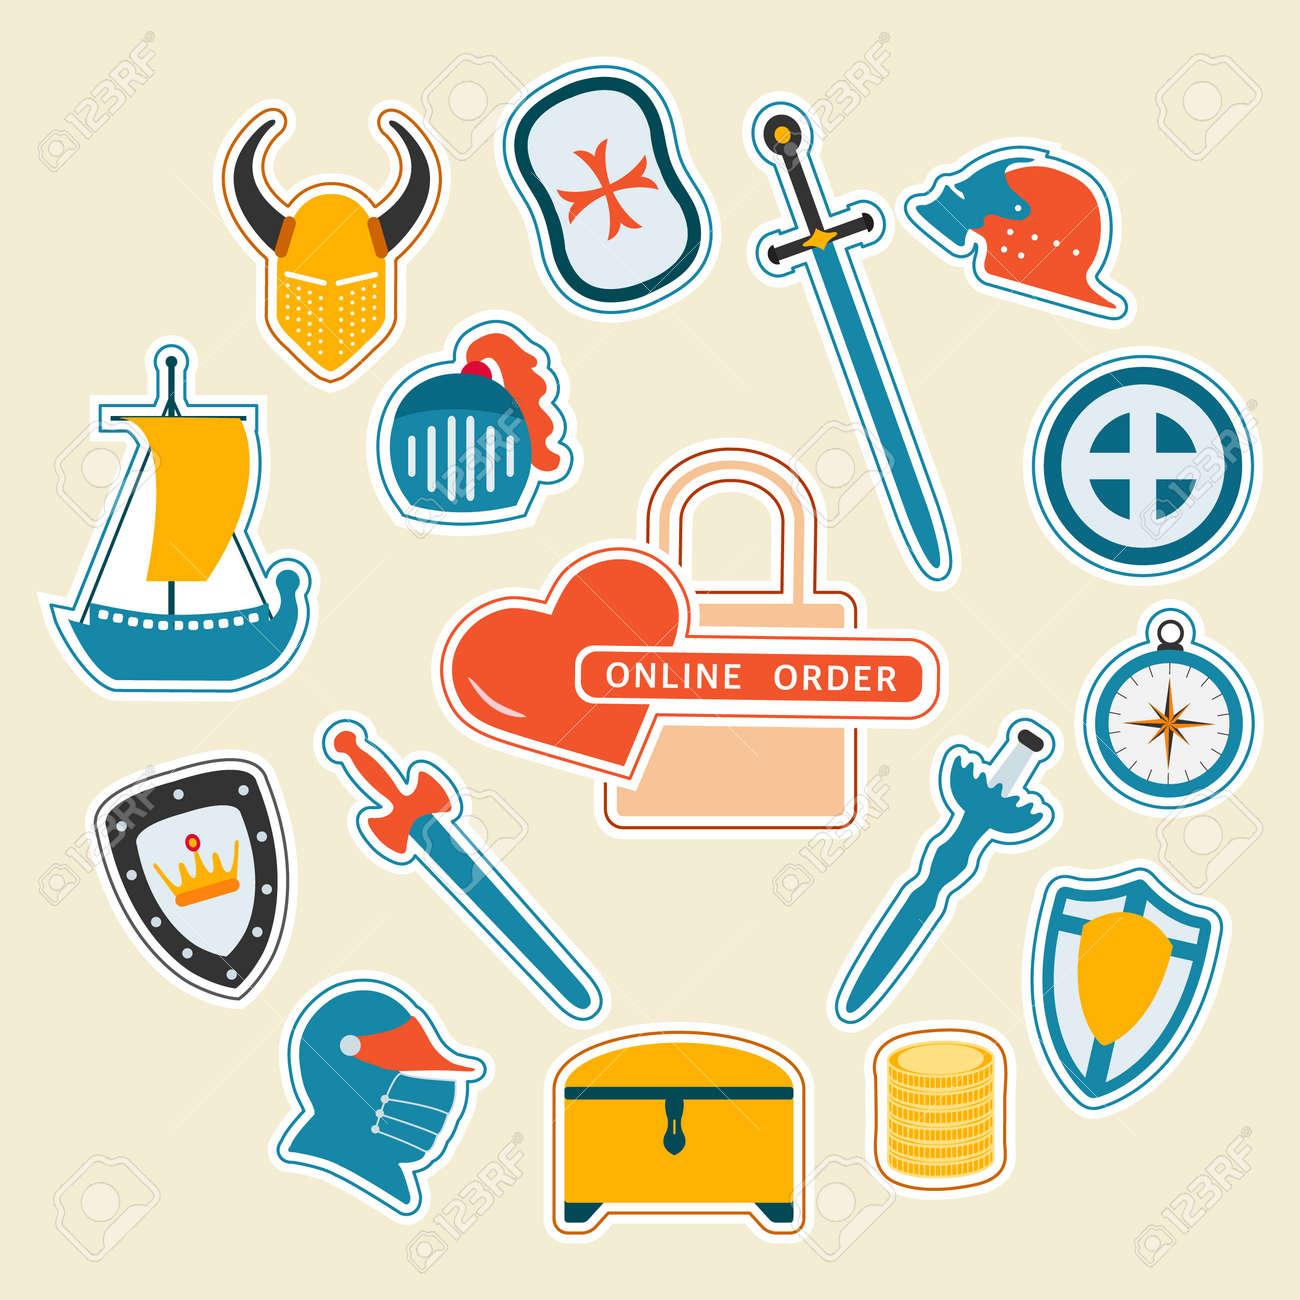 Vector illustration Stickers pack Online order Kid toys Knightly sword, shield, helmet, treasure chest, ship. Happy childhood Gaming items Primary school Elementary grade Kindergarten Game - 170249854